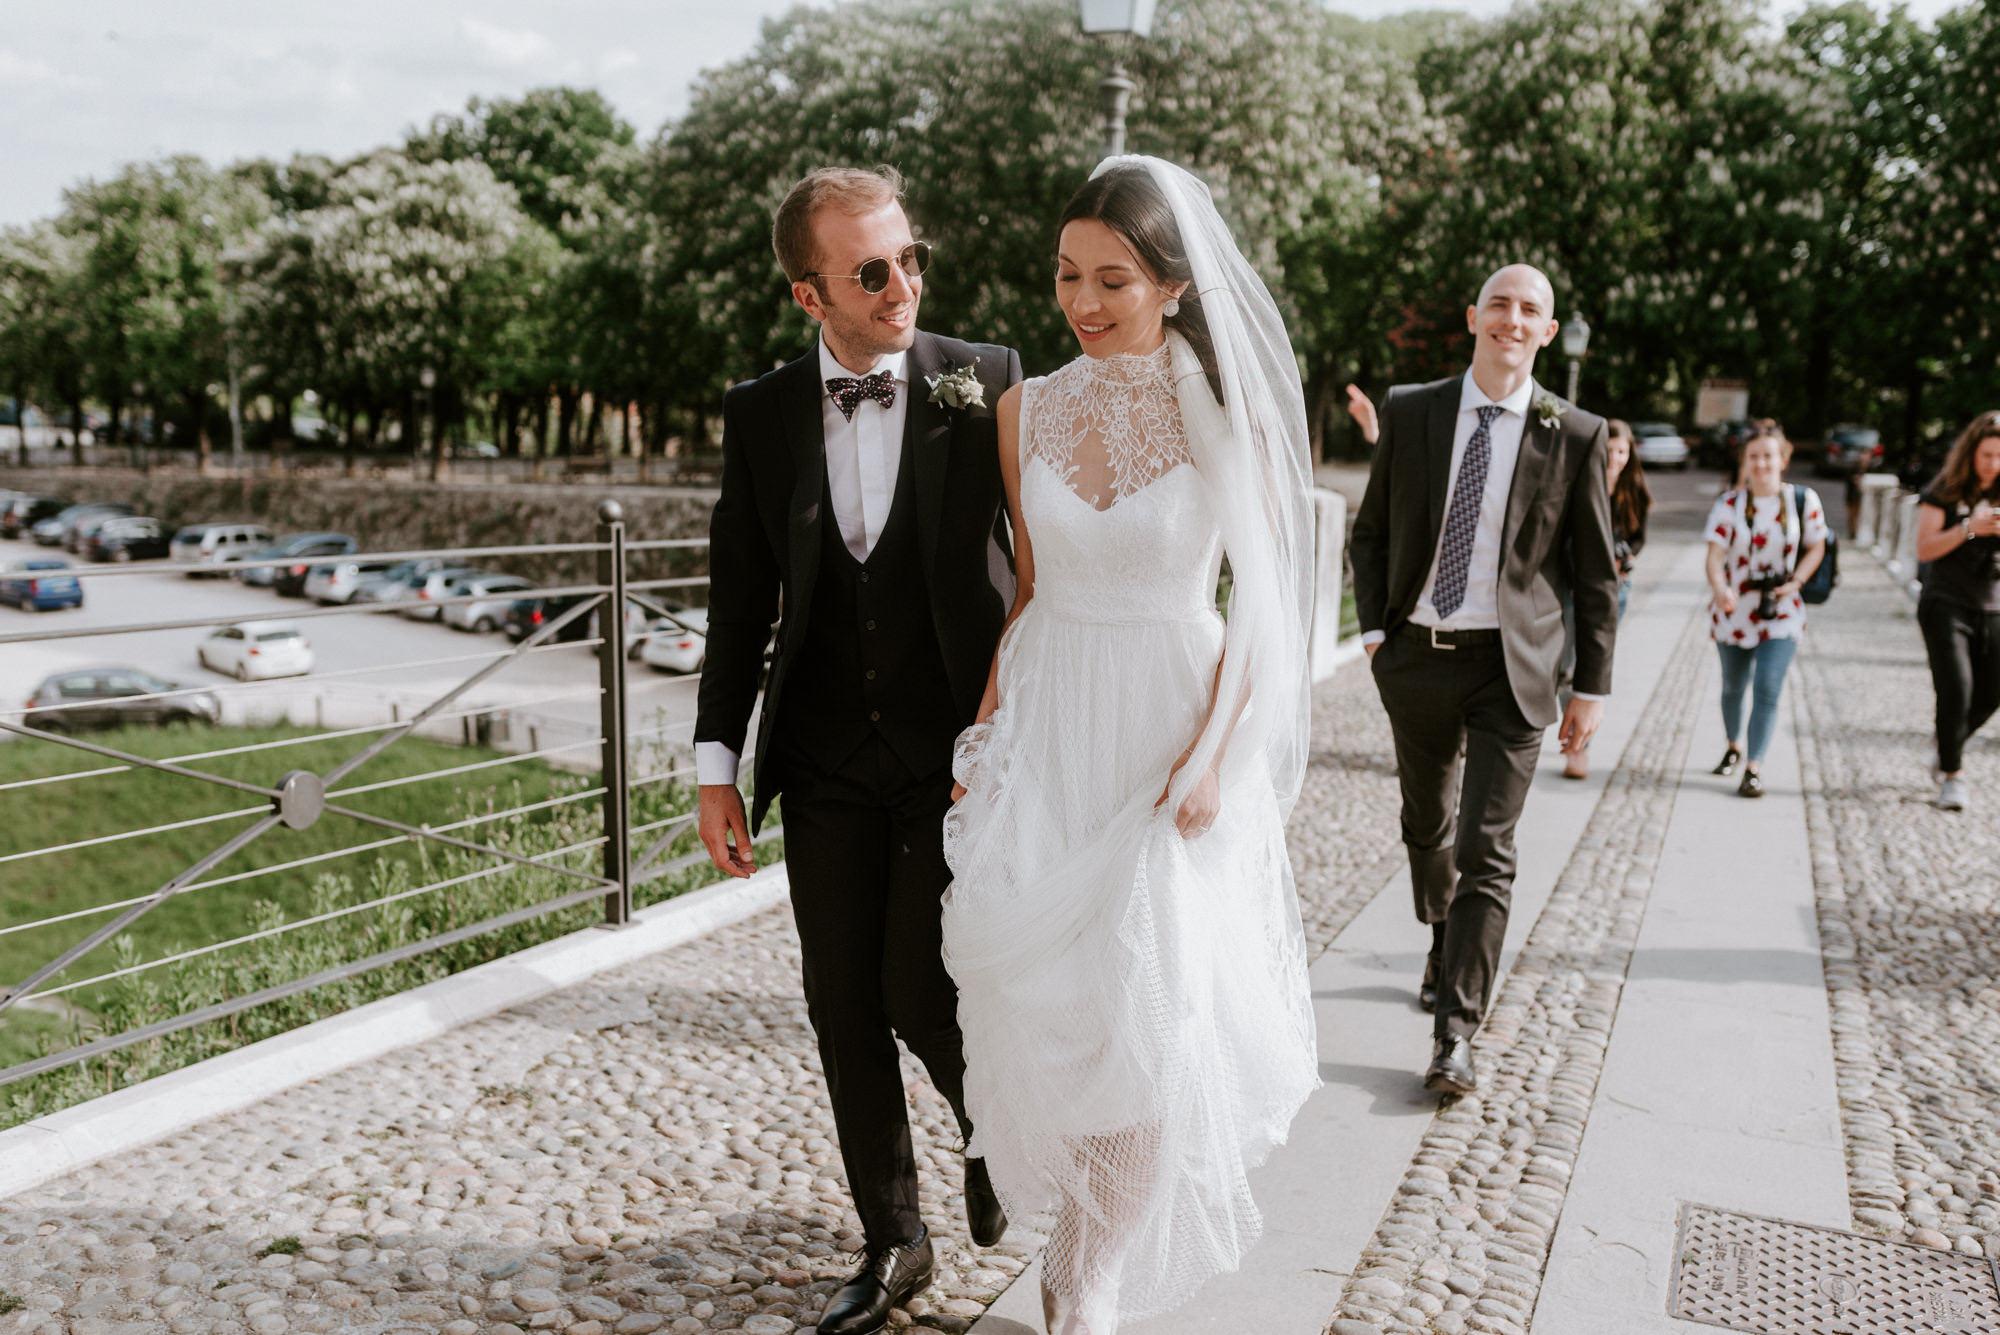 FOTO+PHOTO+BODA+WEDDING+ITALIA+ITALY+MAURICIO+GARAY+MAURICIOGARAY+WEDDINPHOTOGRAPHER+FOTOGRAFODEBODA-1158.jpg